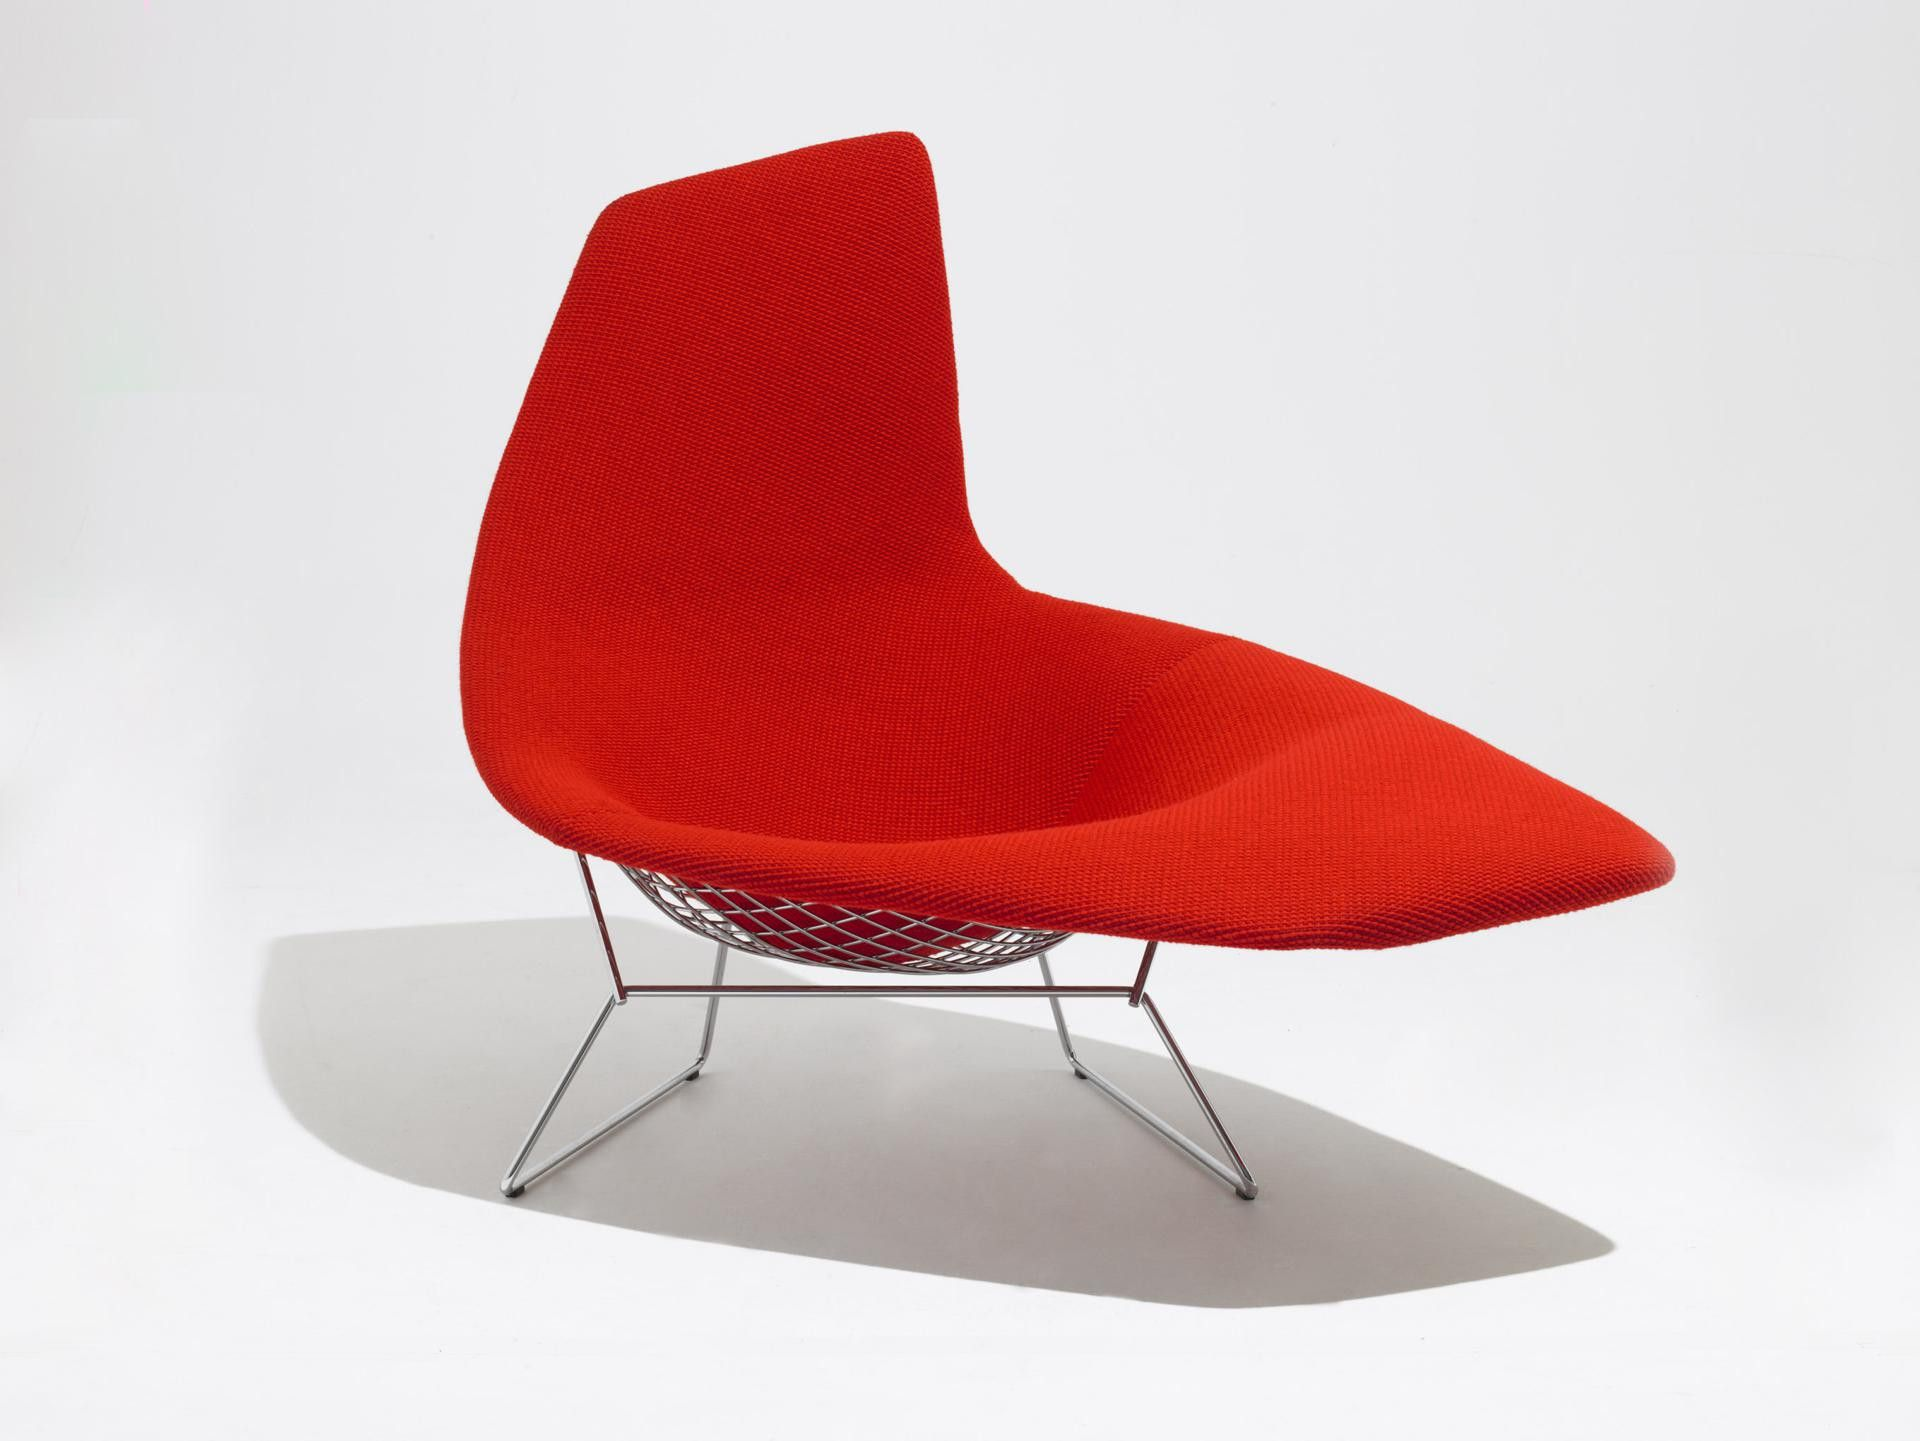 bertoia asymmetric chaise studio italia. Black Bedroom Furniture Sets. Home Design Ideas